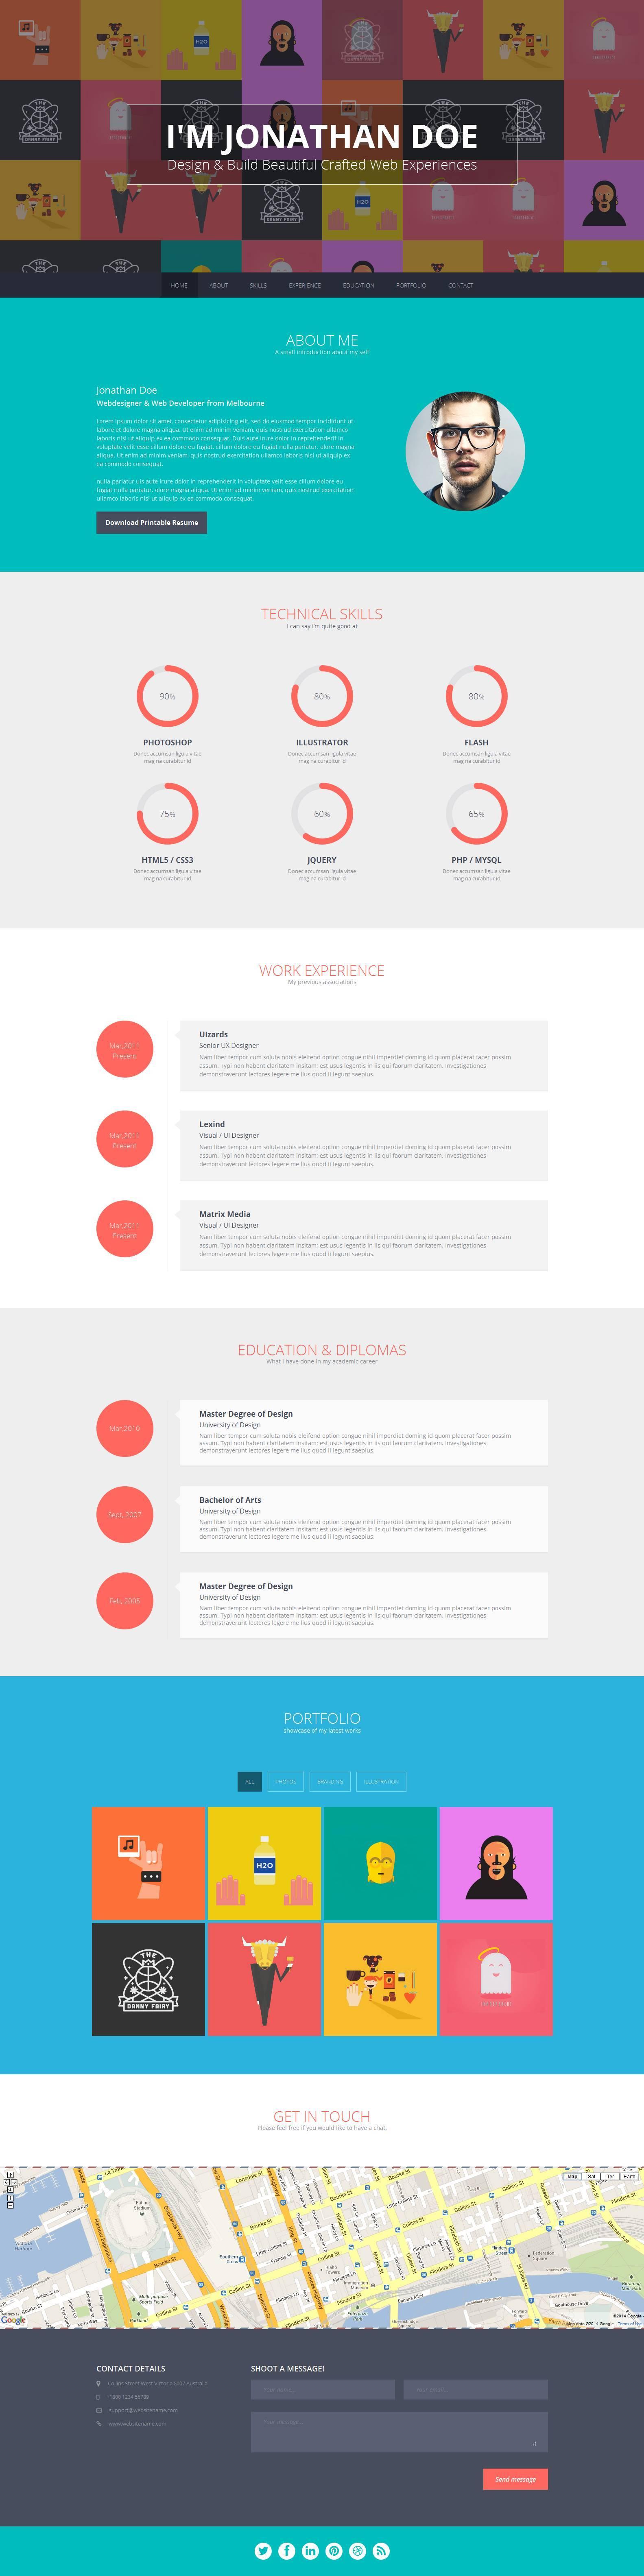 flato responsive resume joomla template - Resume Cv Joomla Template